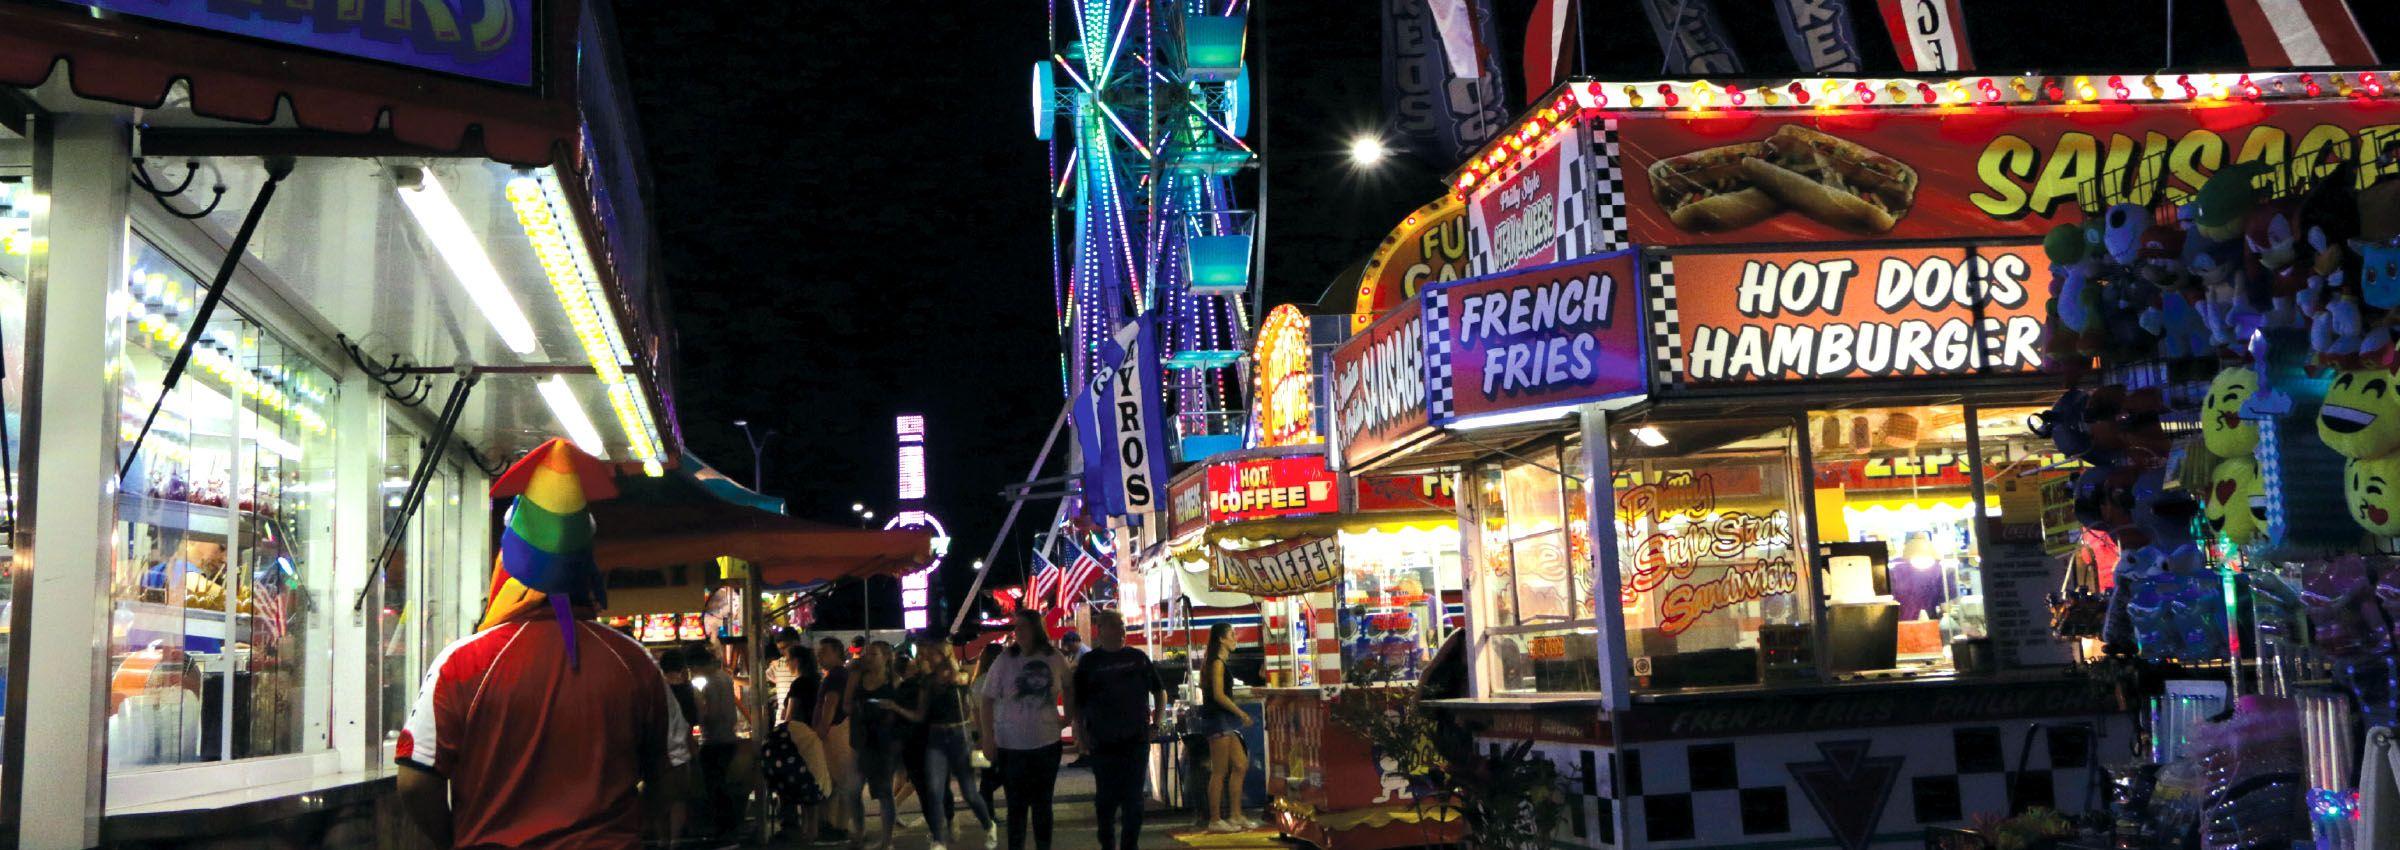 Upcoming County Fairs Carnivals Amusement Parks